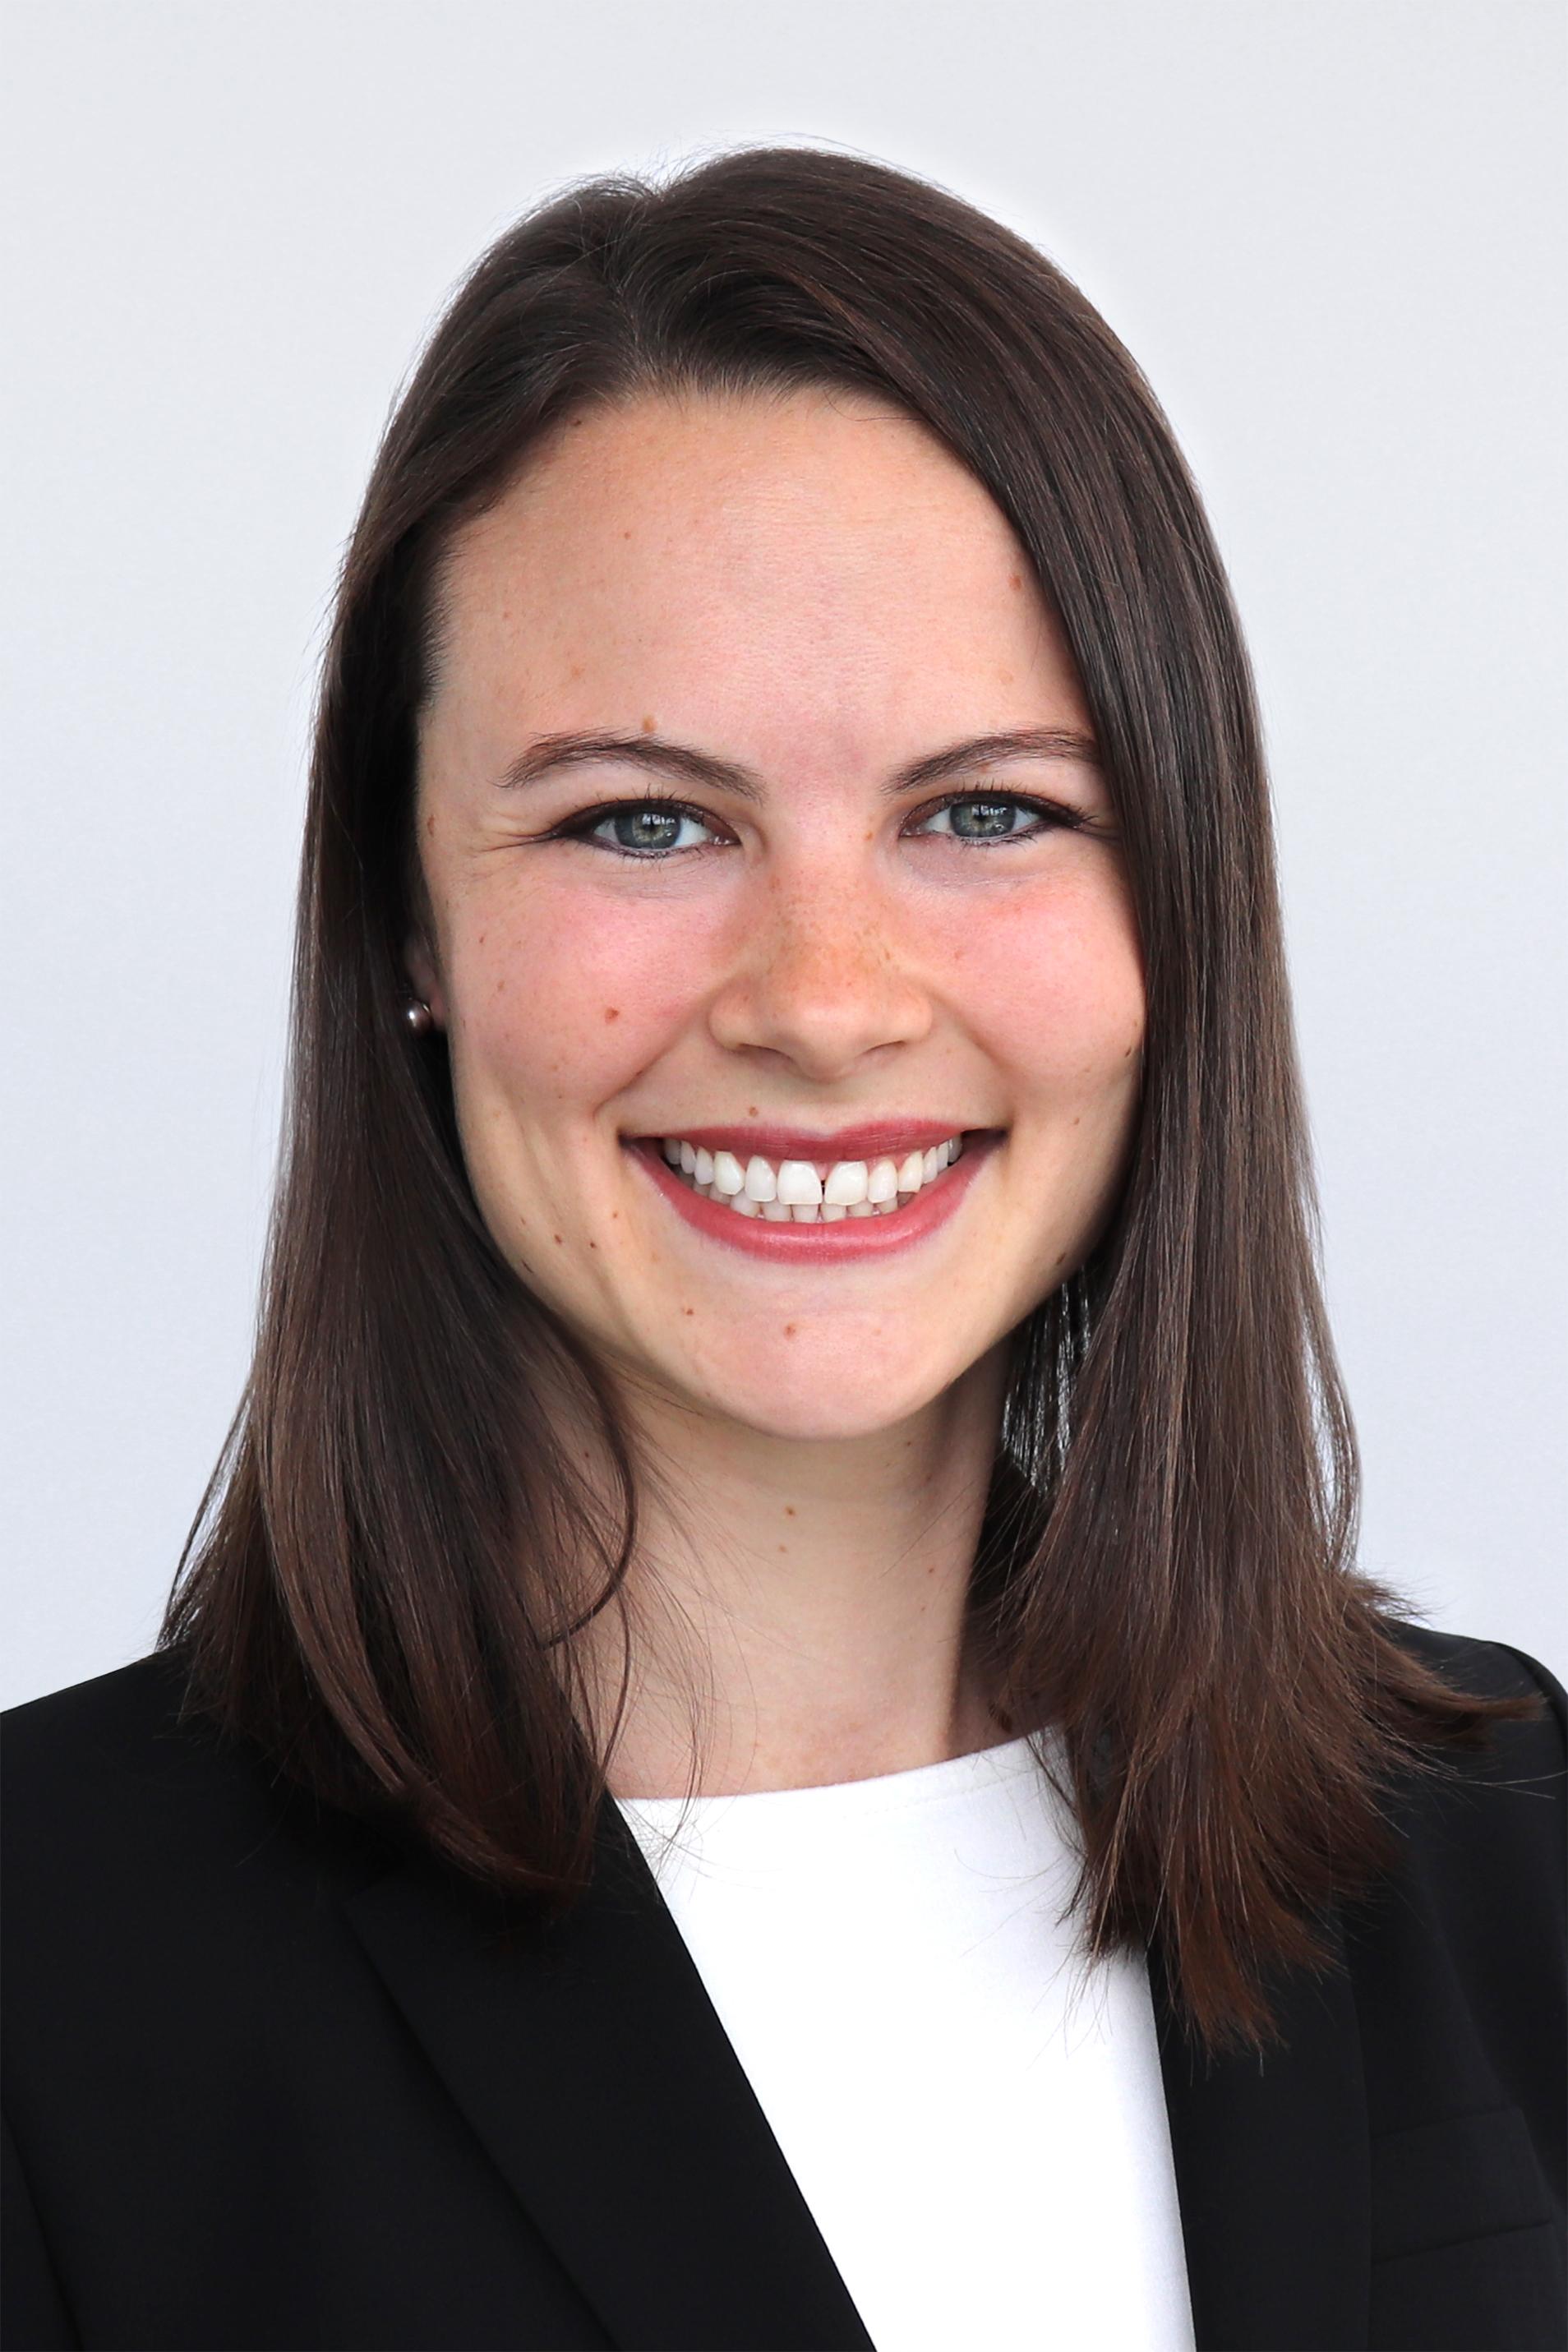 Angela Spangler